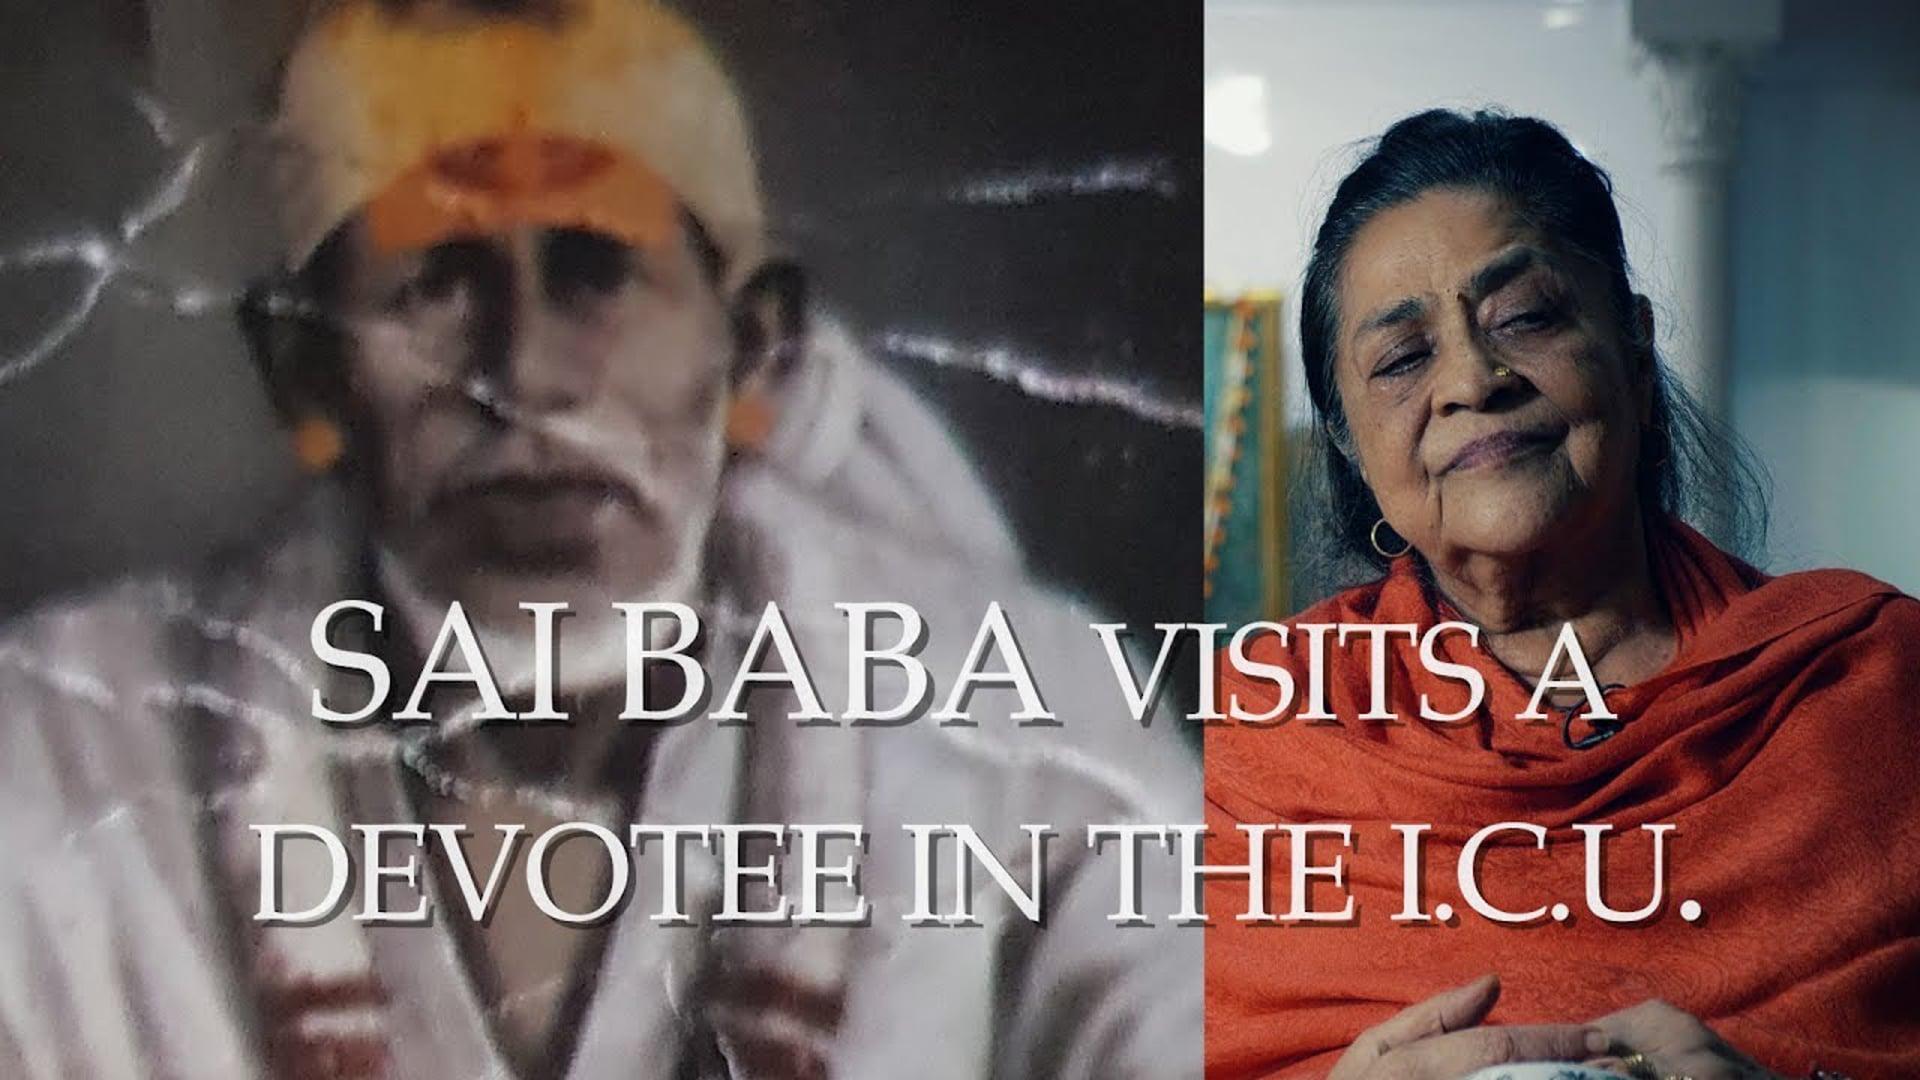 Sai Baba visits His devotee in the ICU